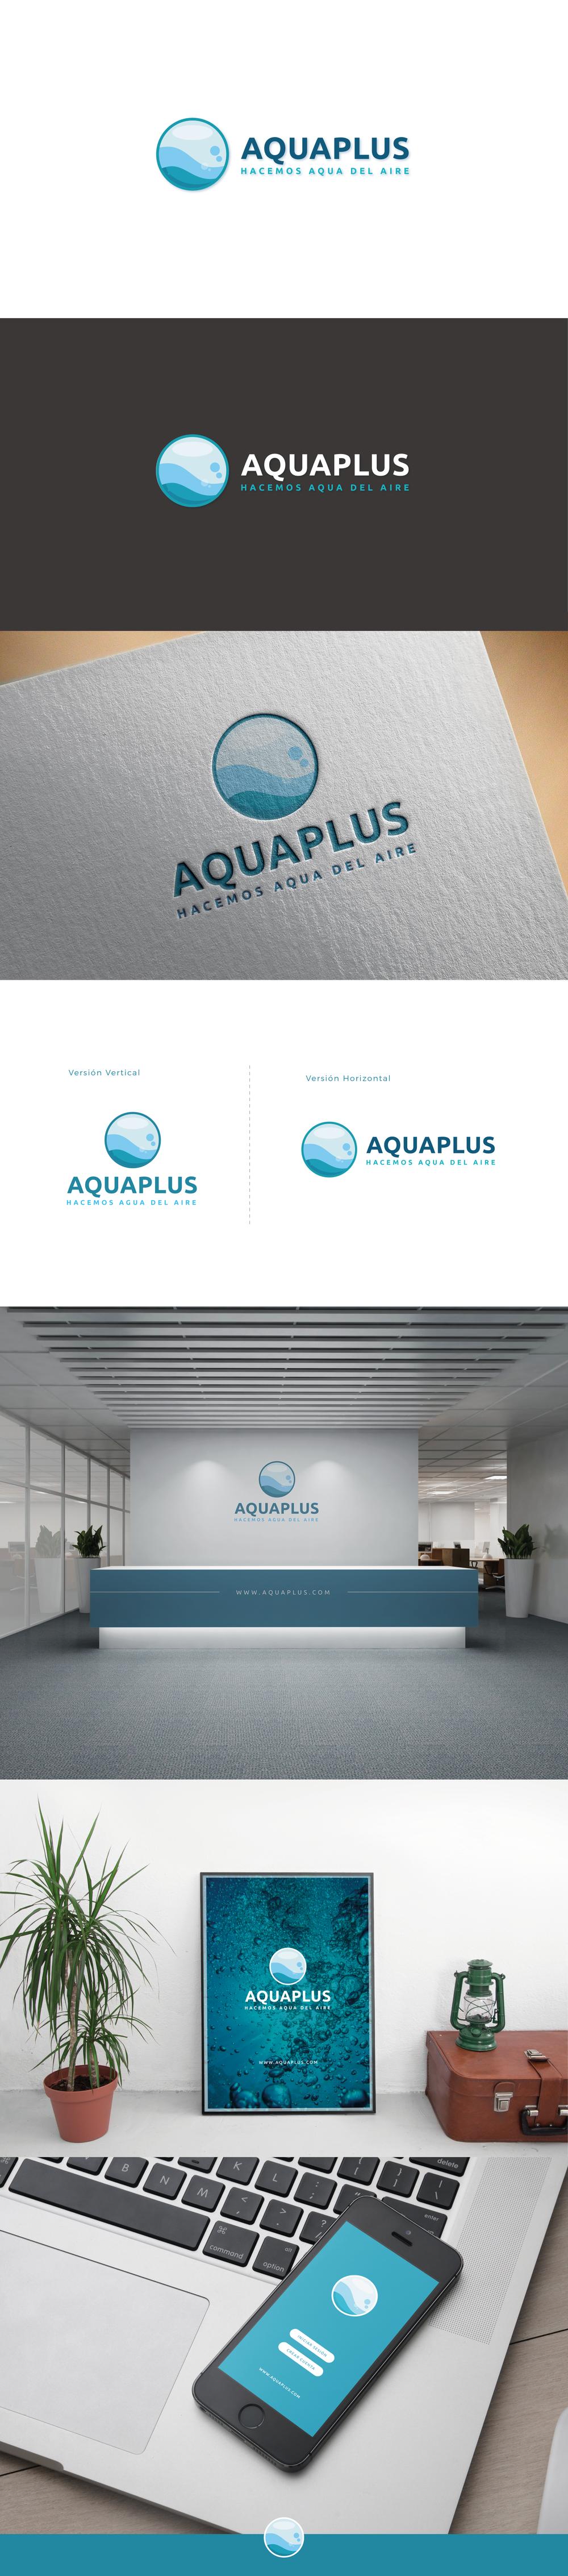 AquaPlusLogo2.png